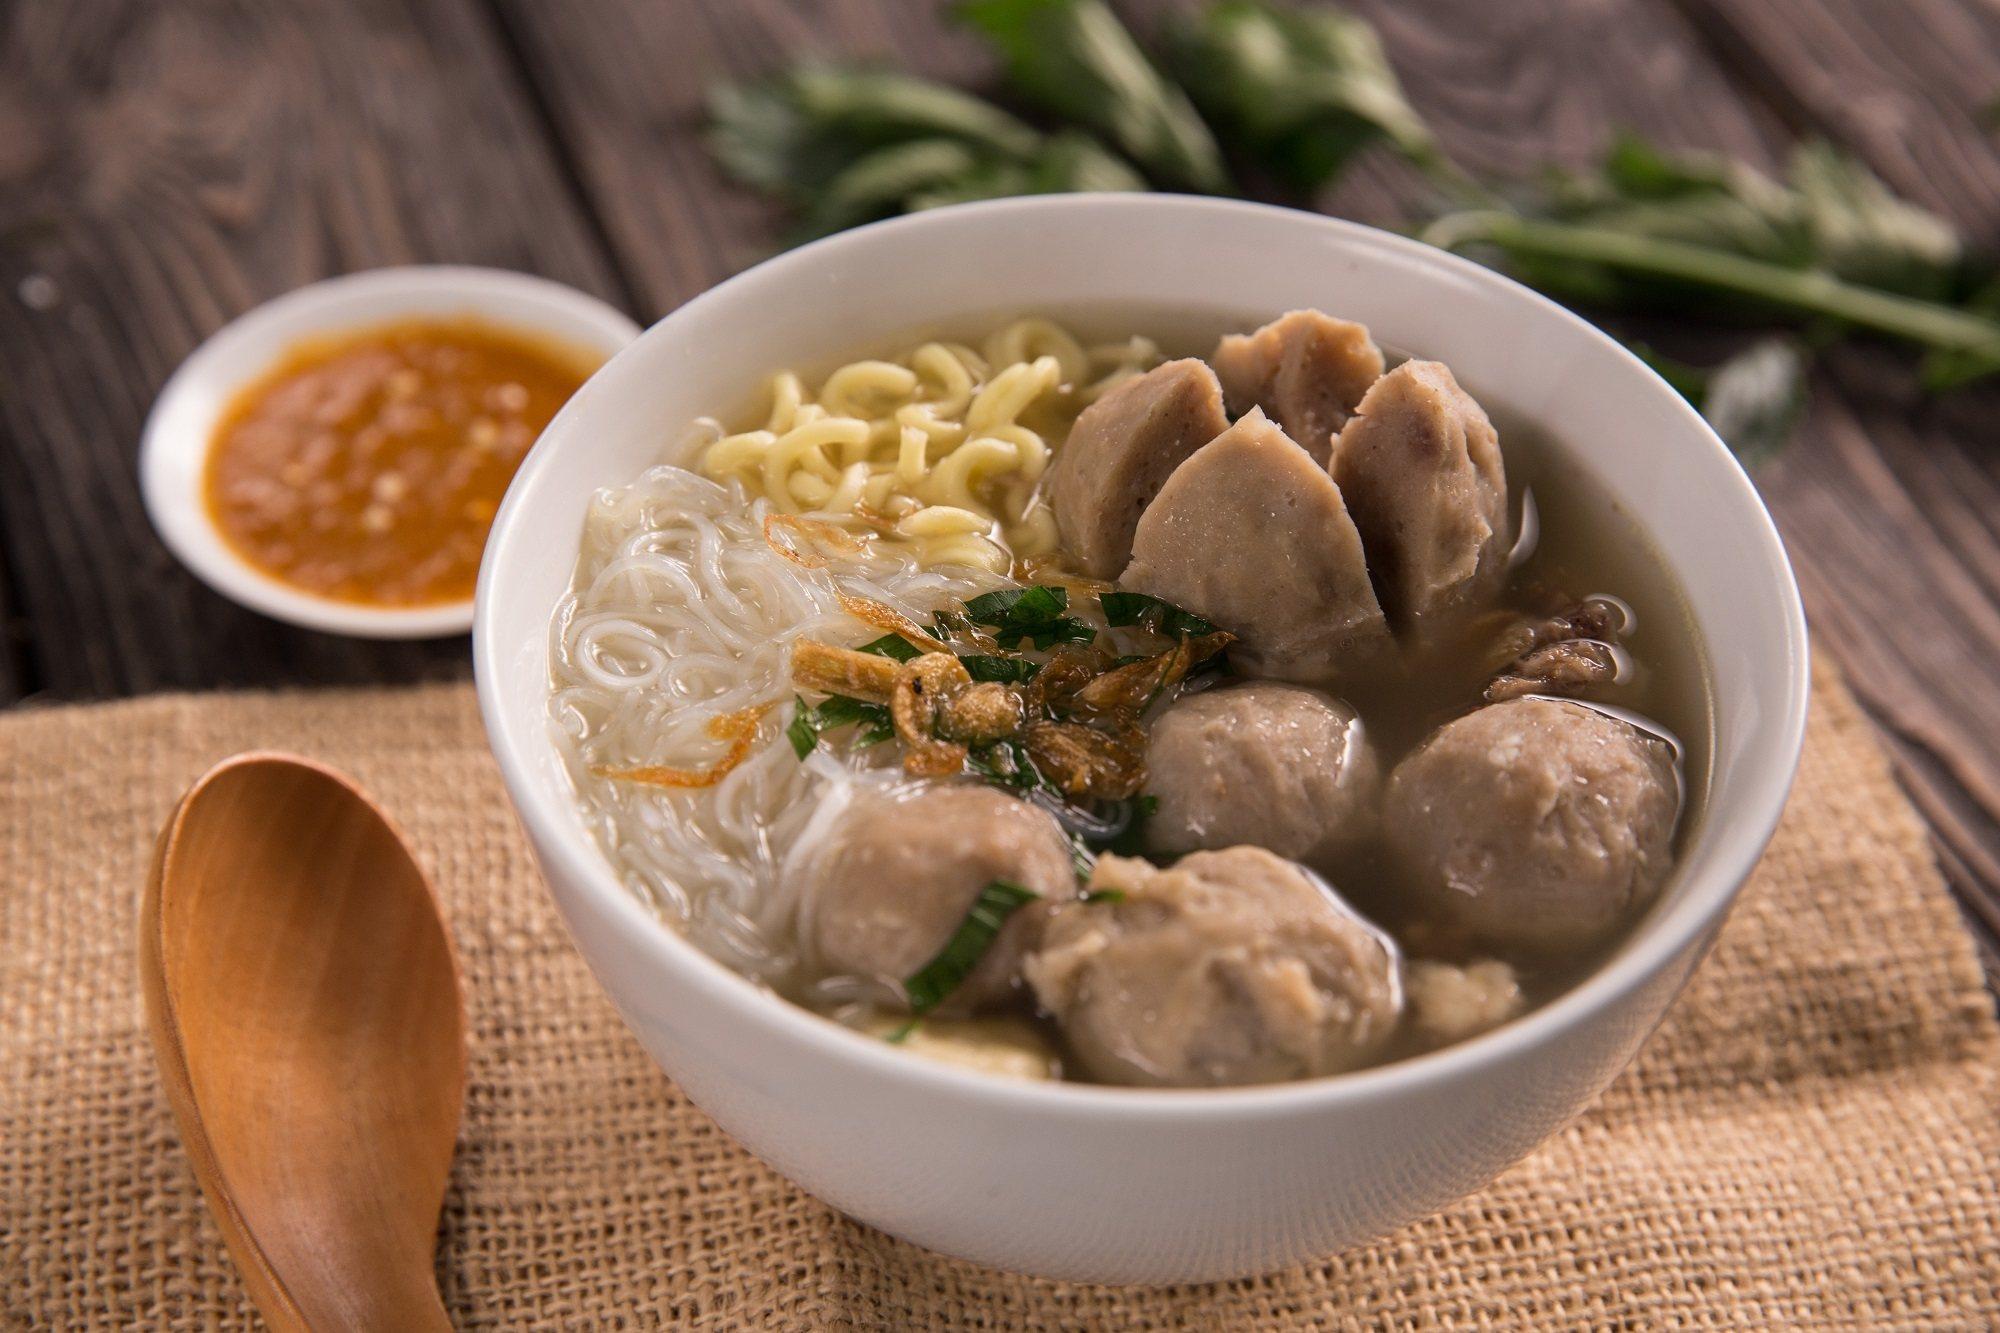 Resep Mie Bakso, Hidangan Tepat Pembuka Musim Hujan